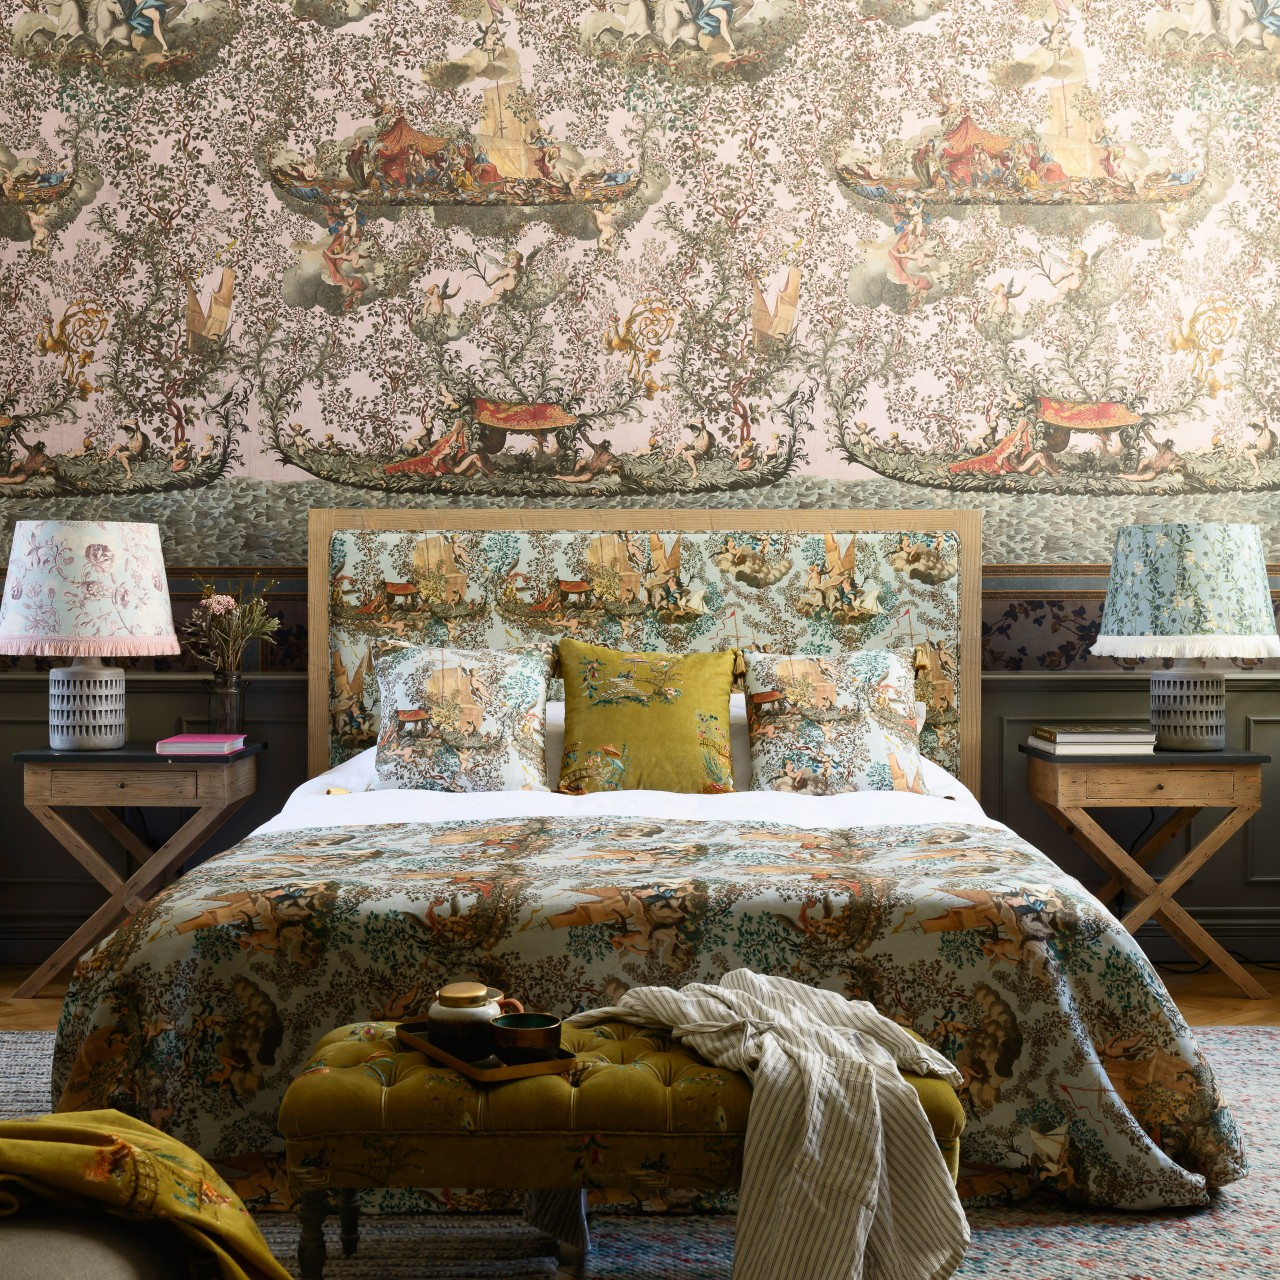 ANTAL Bed - JOURNEY TO EDEN Linen